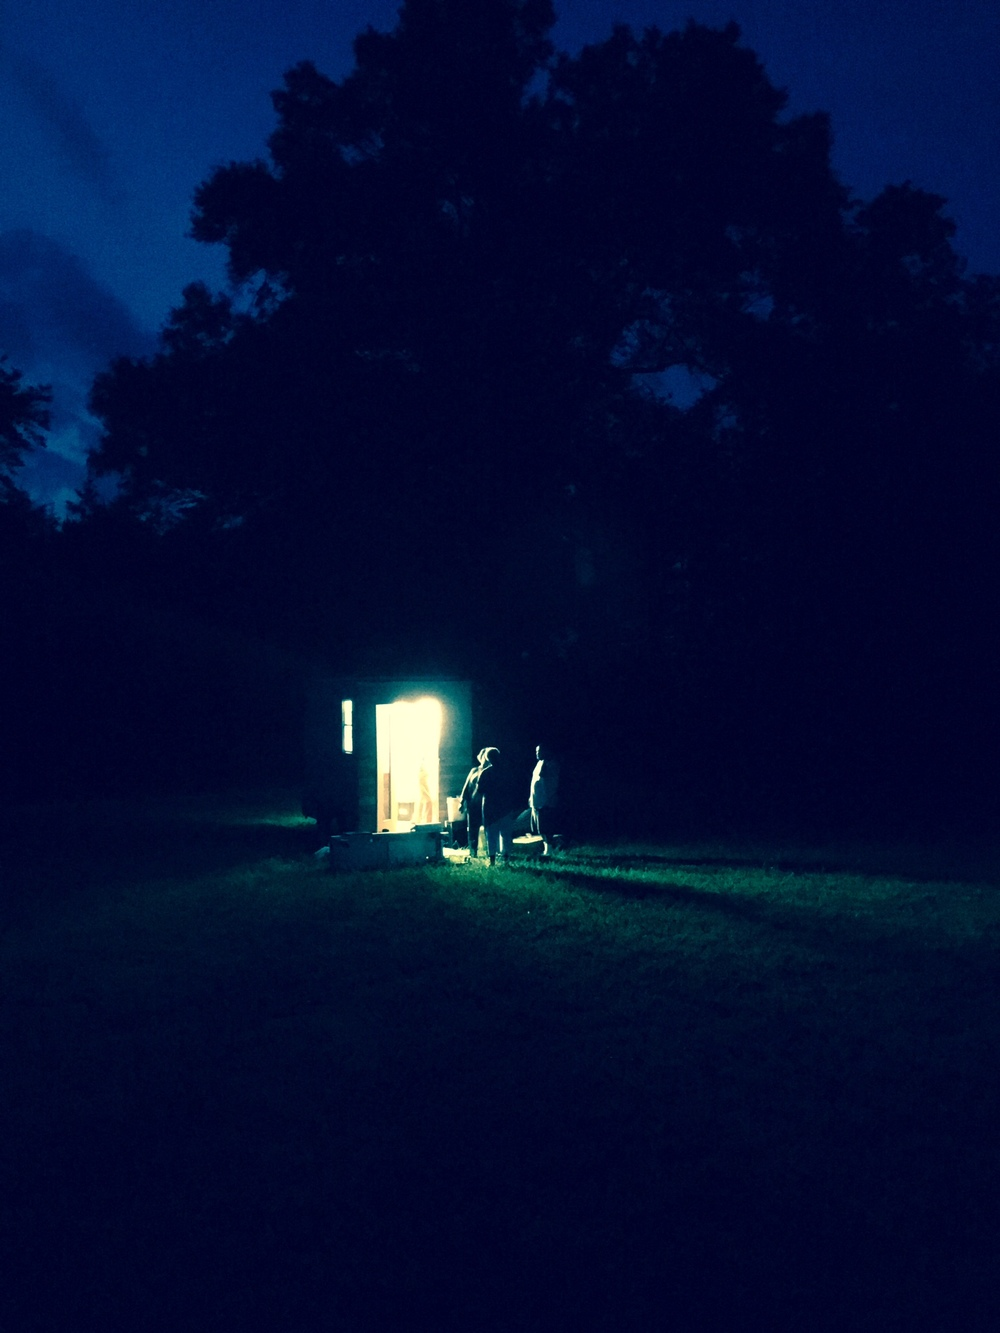 Dyson's mobile studio, Studio South Zero, set up in Alamance County, North Carolina.